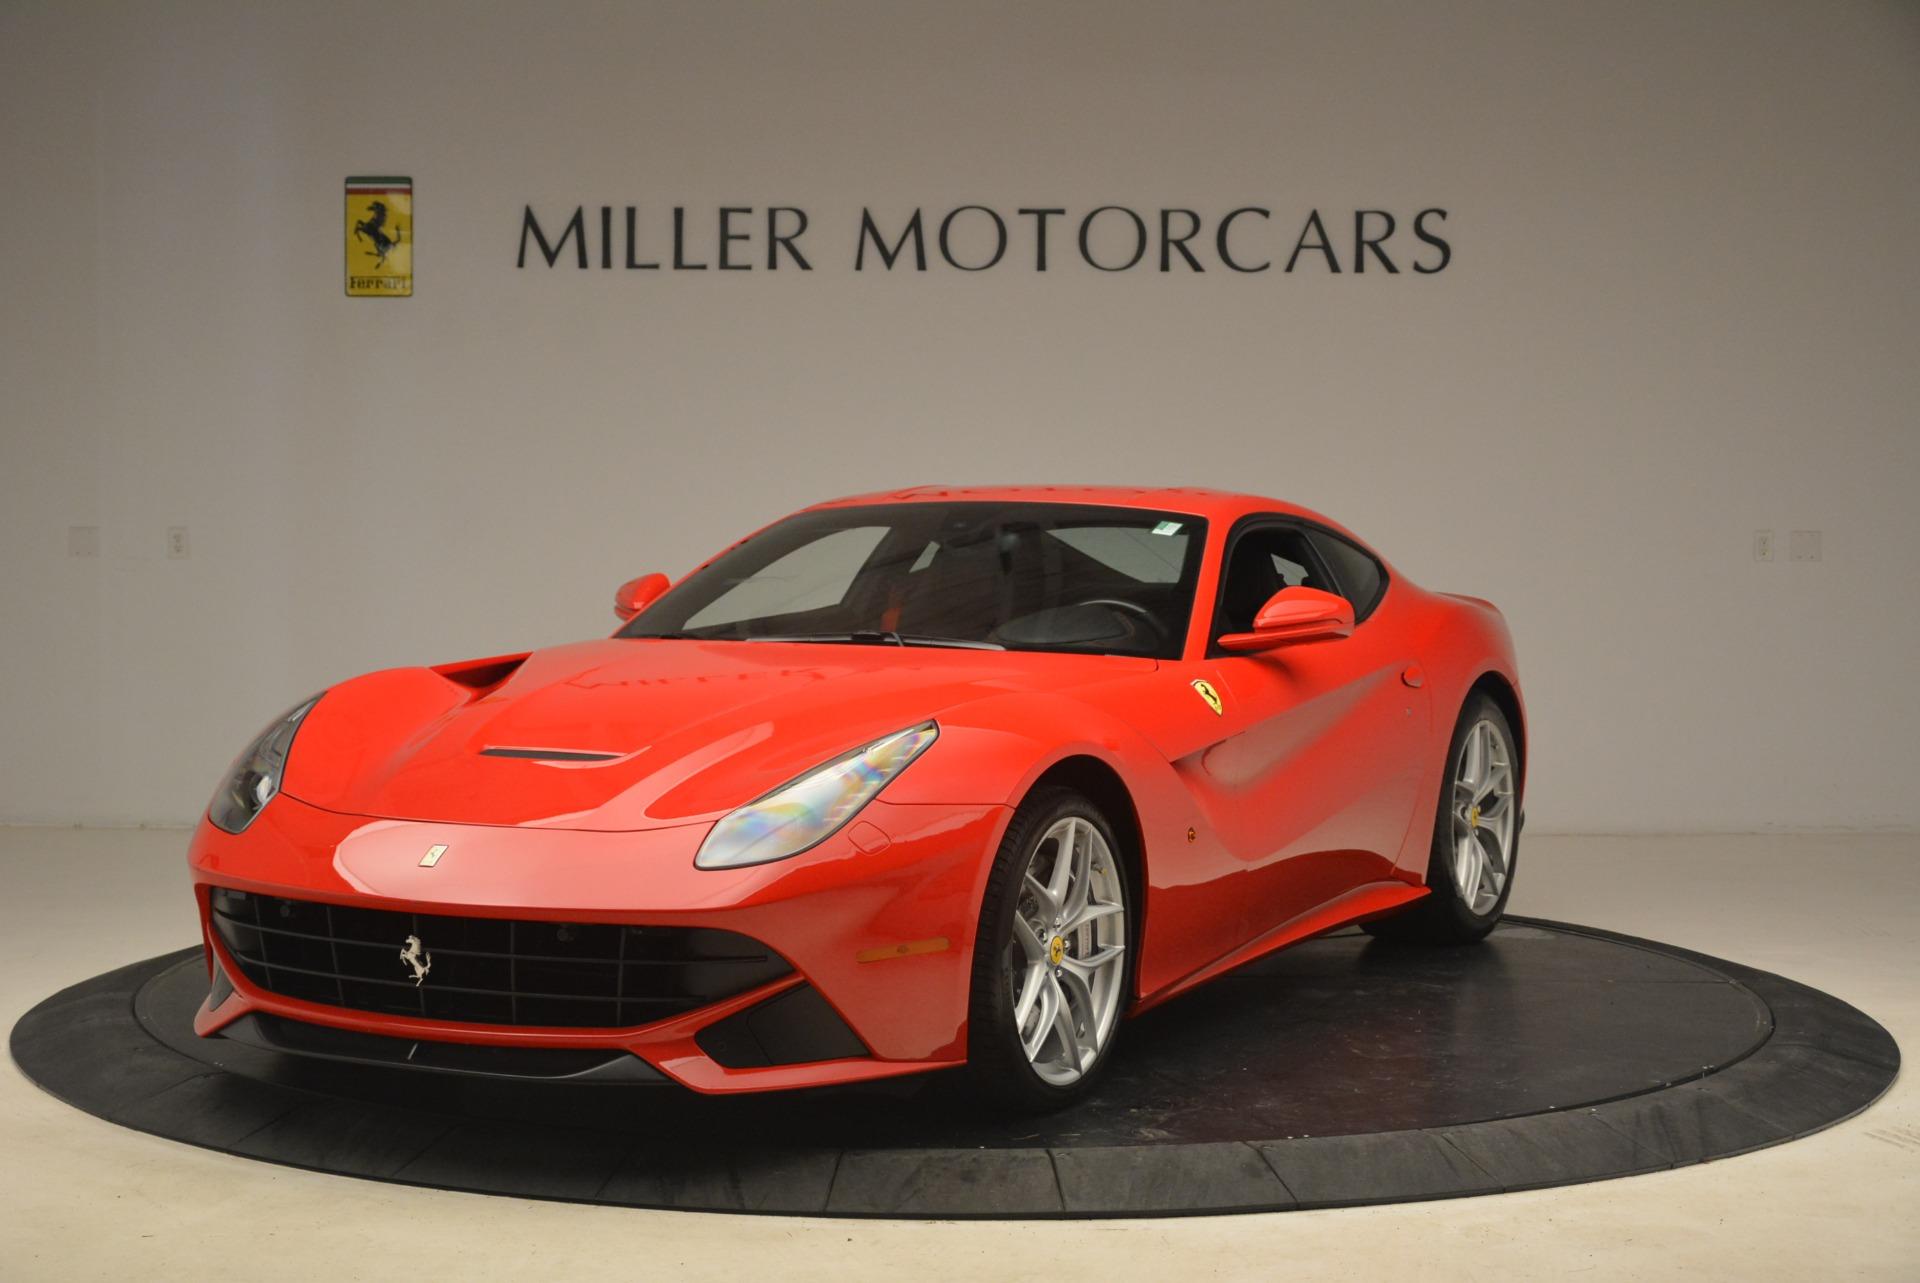 Used 2014 Ferrari F12 Berlinetta for sale Sold at Alfa Romeo of Greenwich in Greenwich CT 06830 1